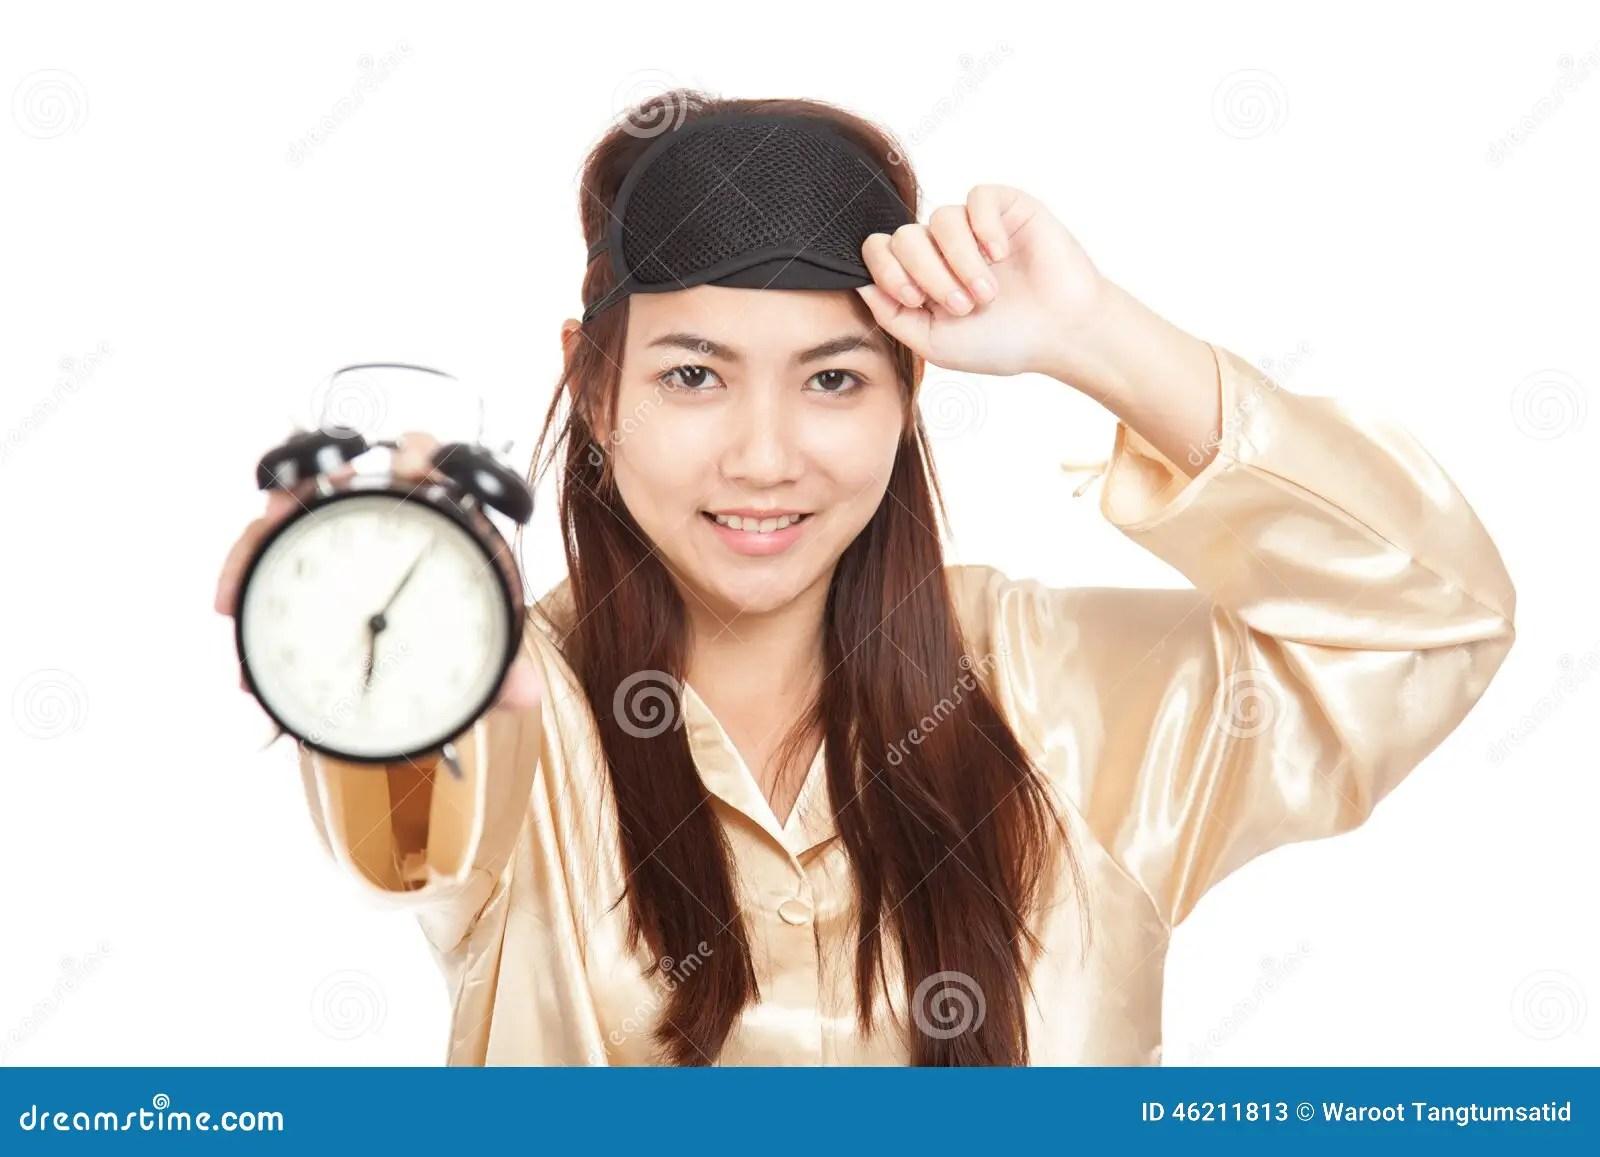 Laptop Alarm Clock